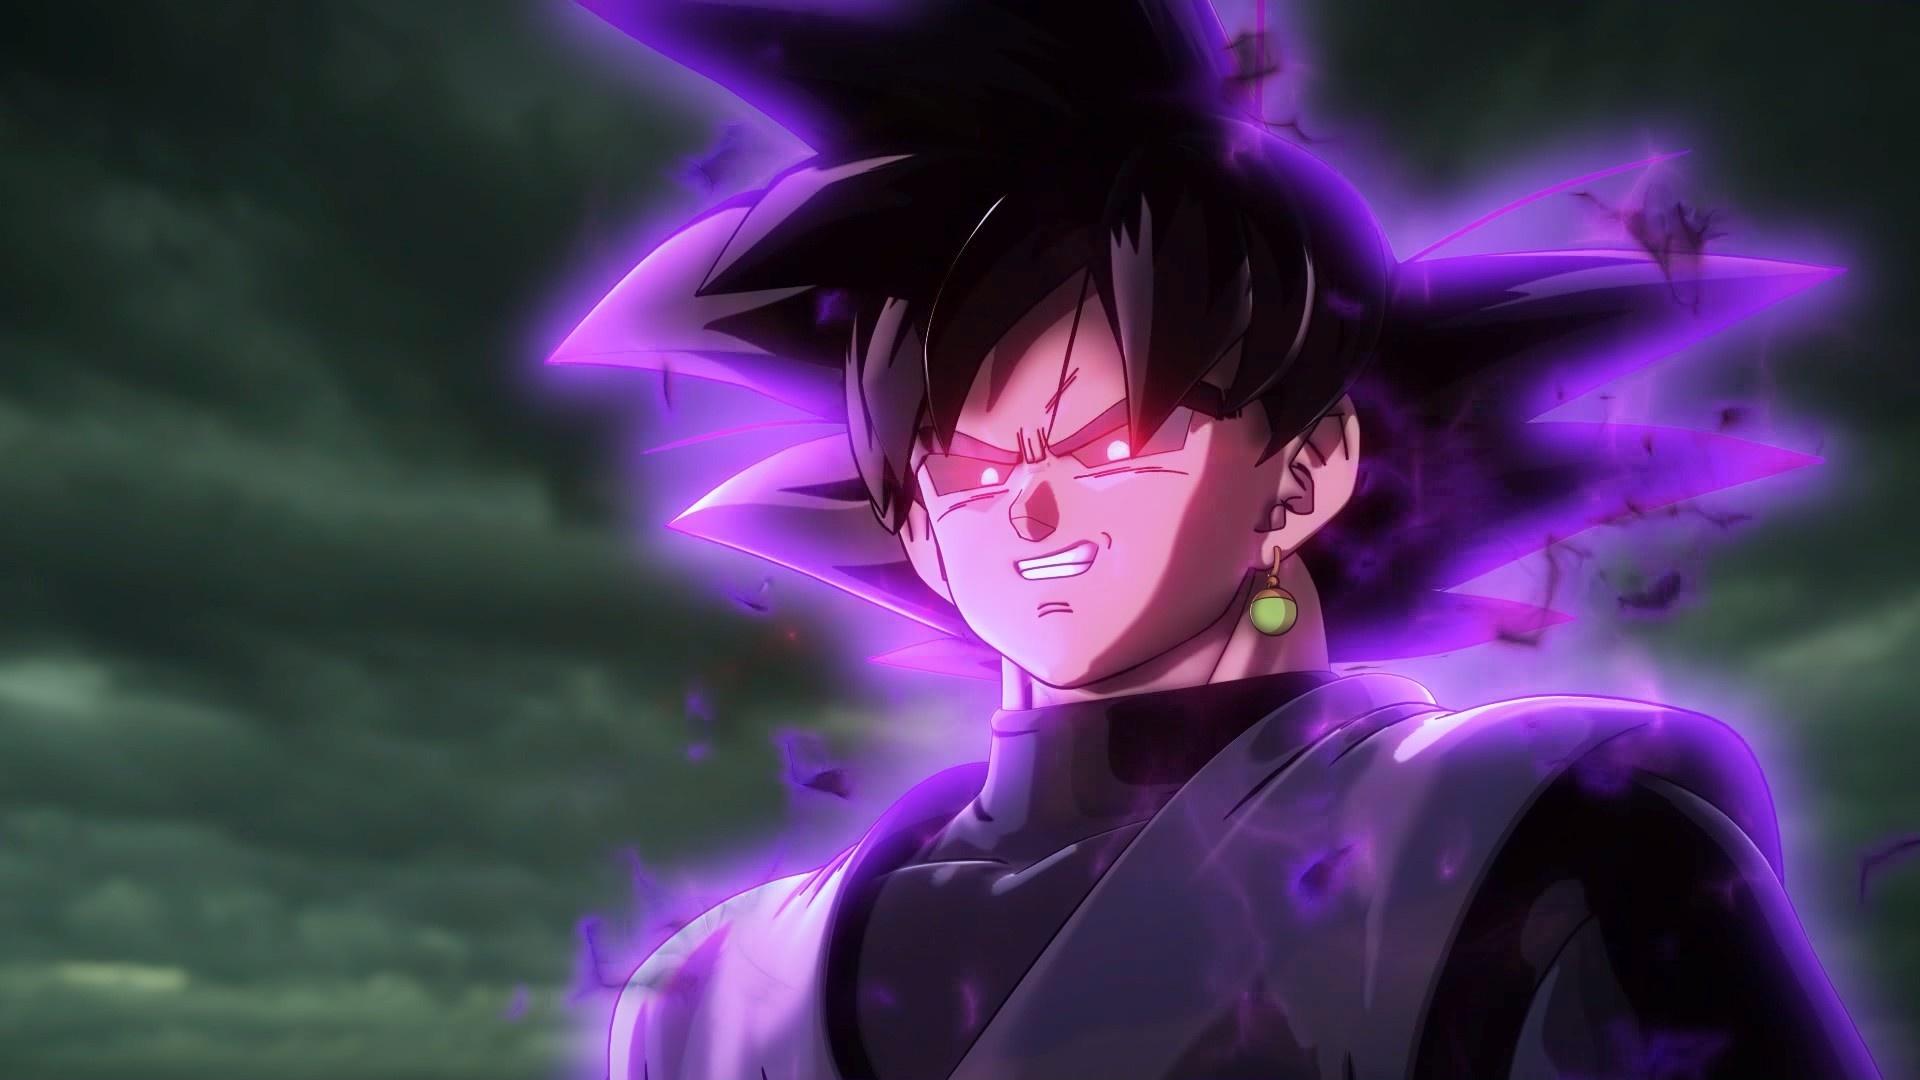 Goku Black desktop wallpaper